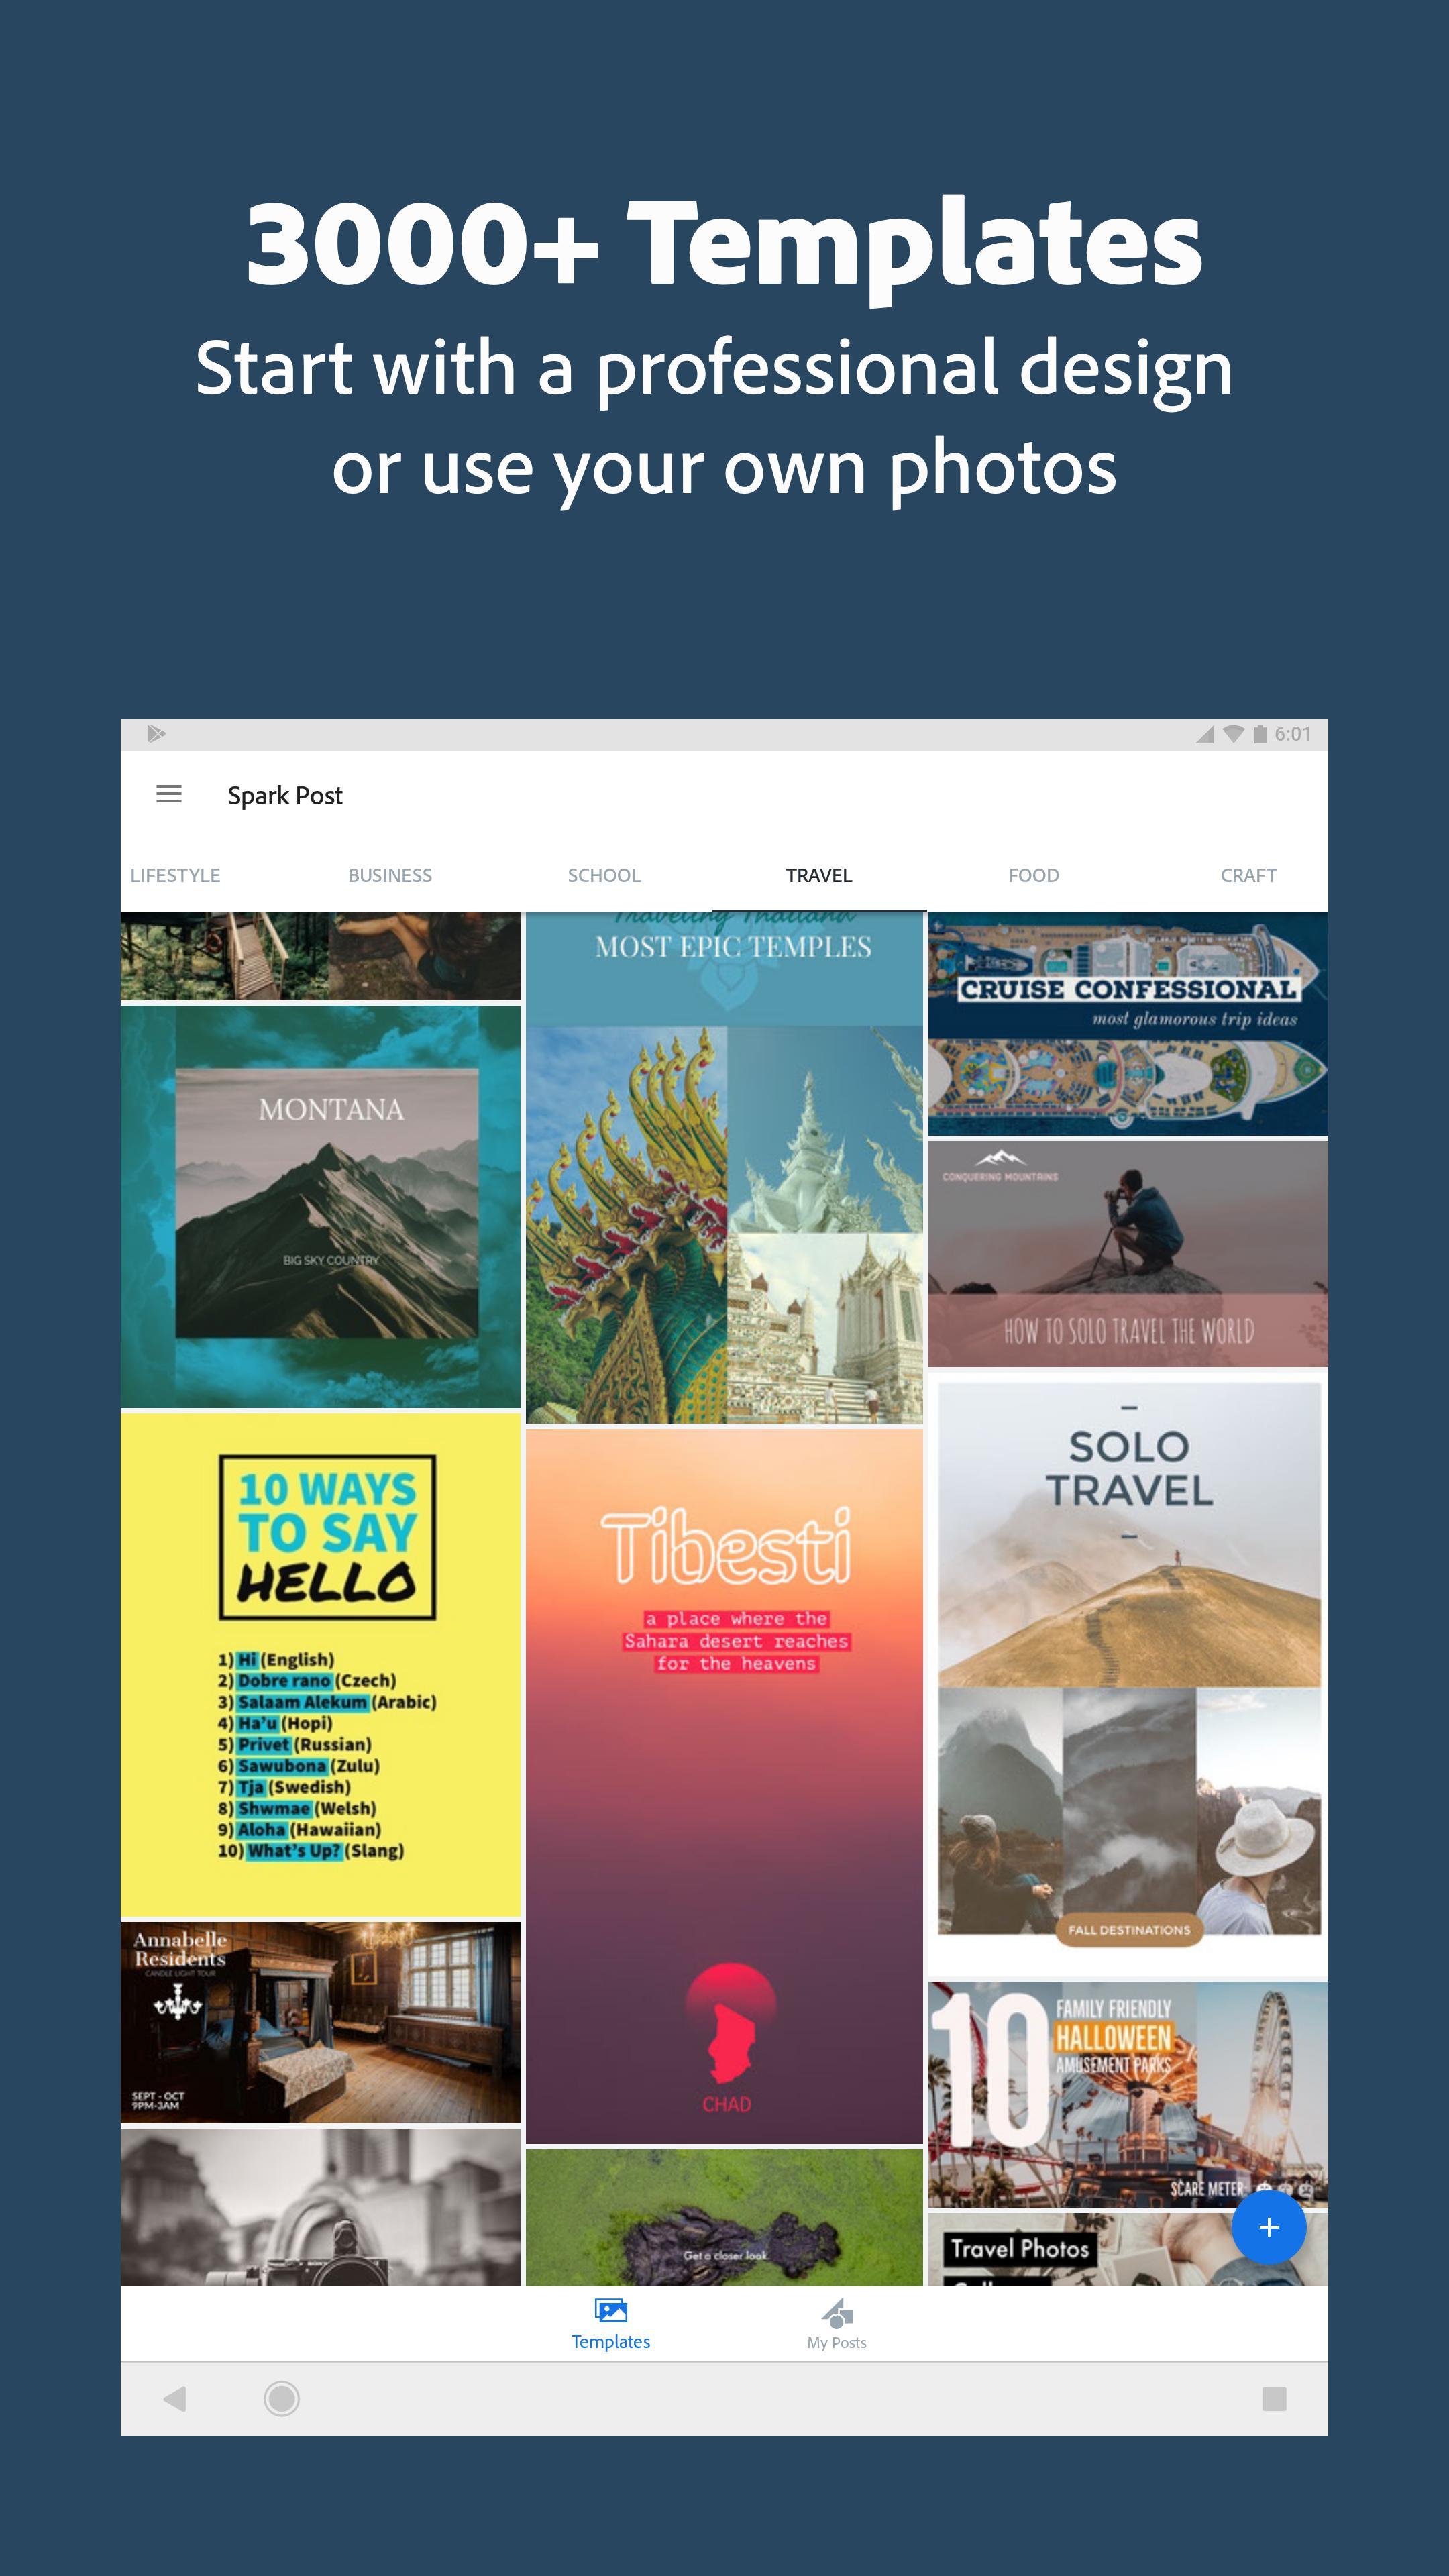 Adobe Spark Post: Graphic design made easy 4.6.0 Screenshot 15